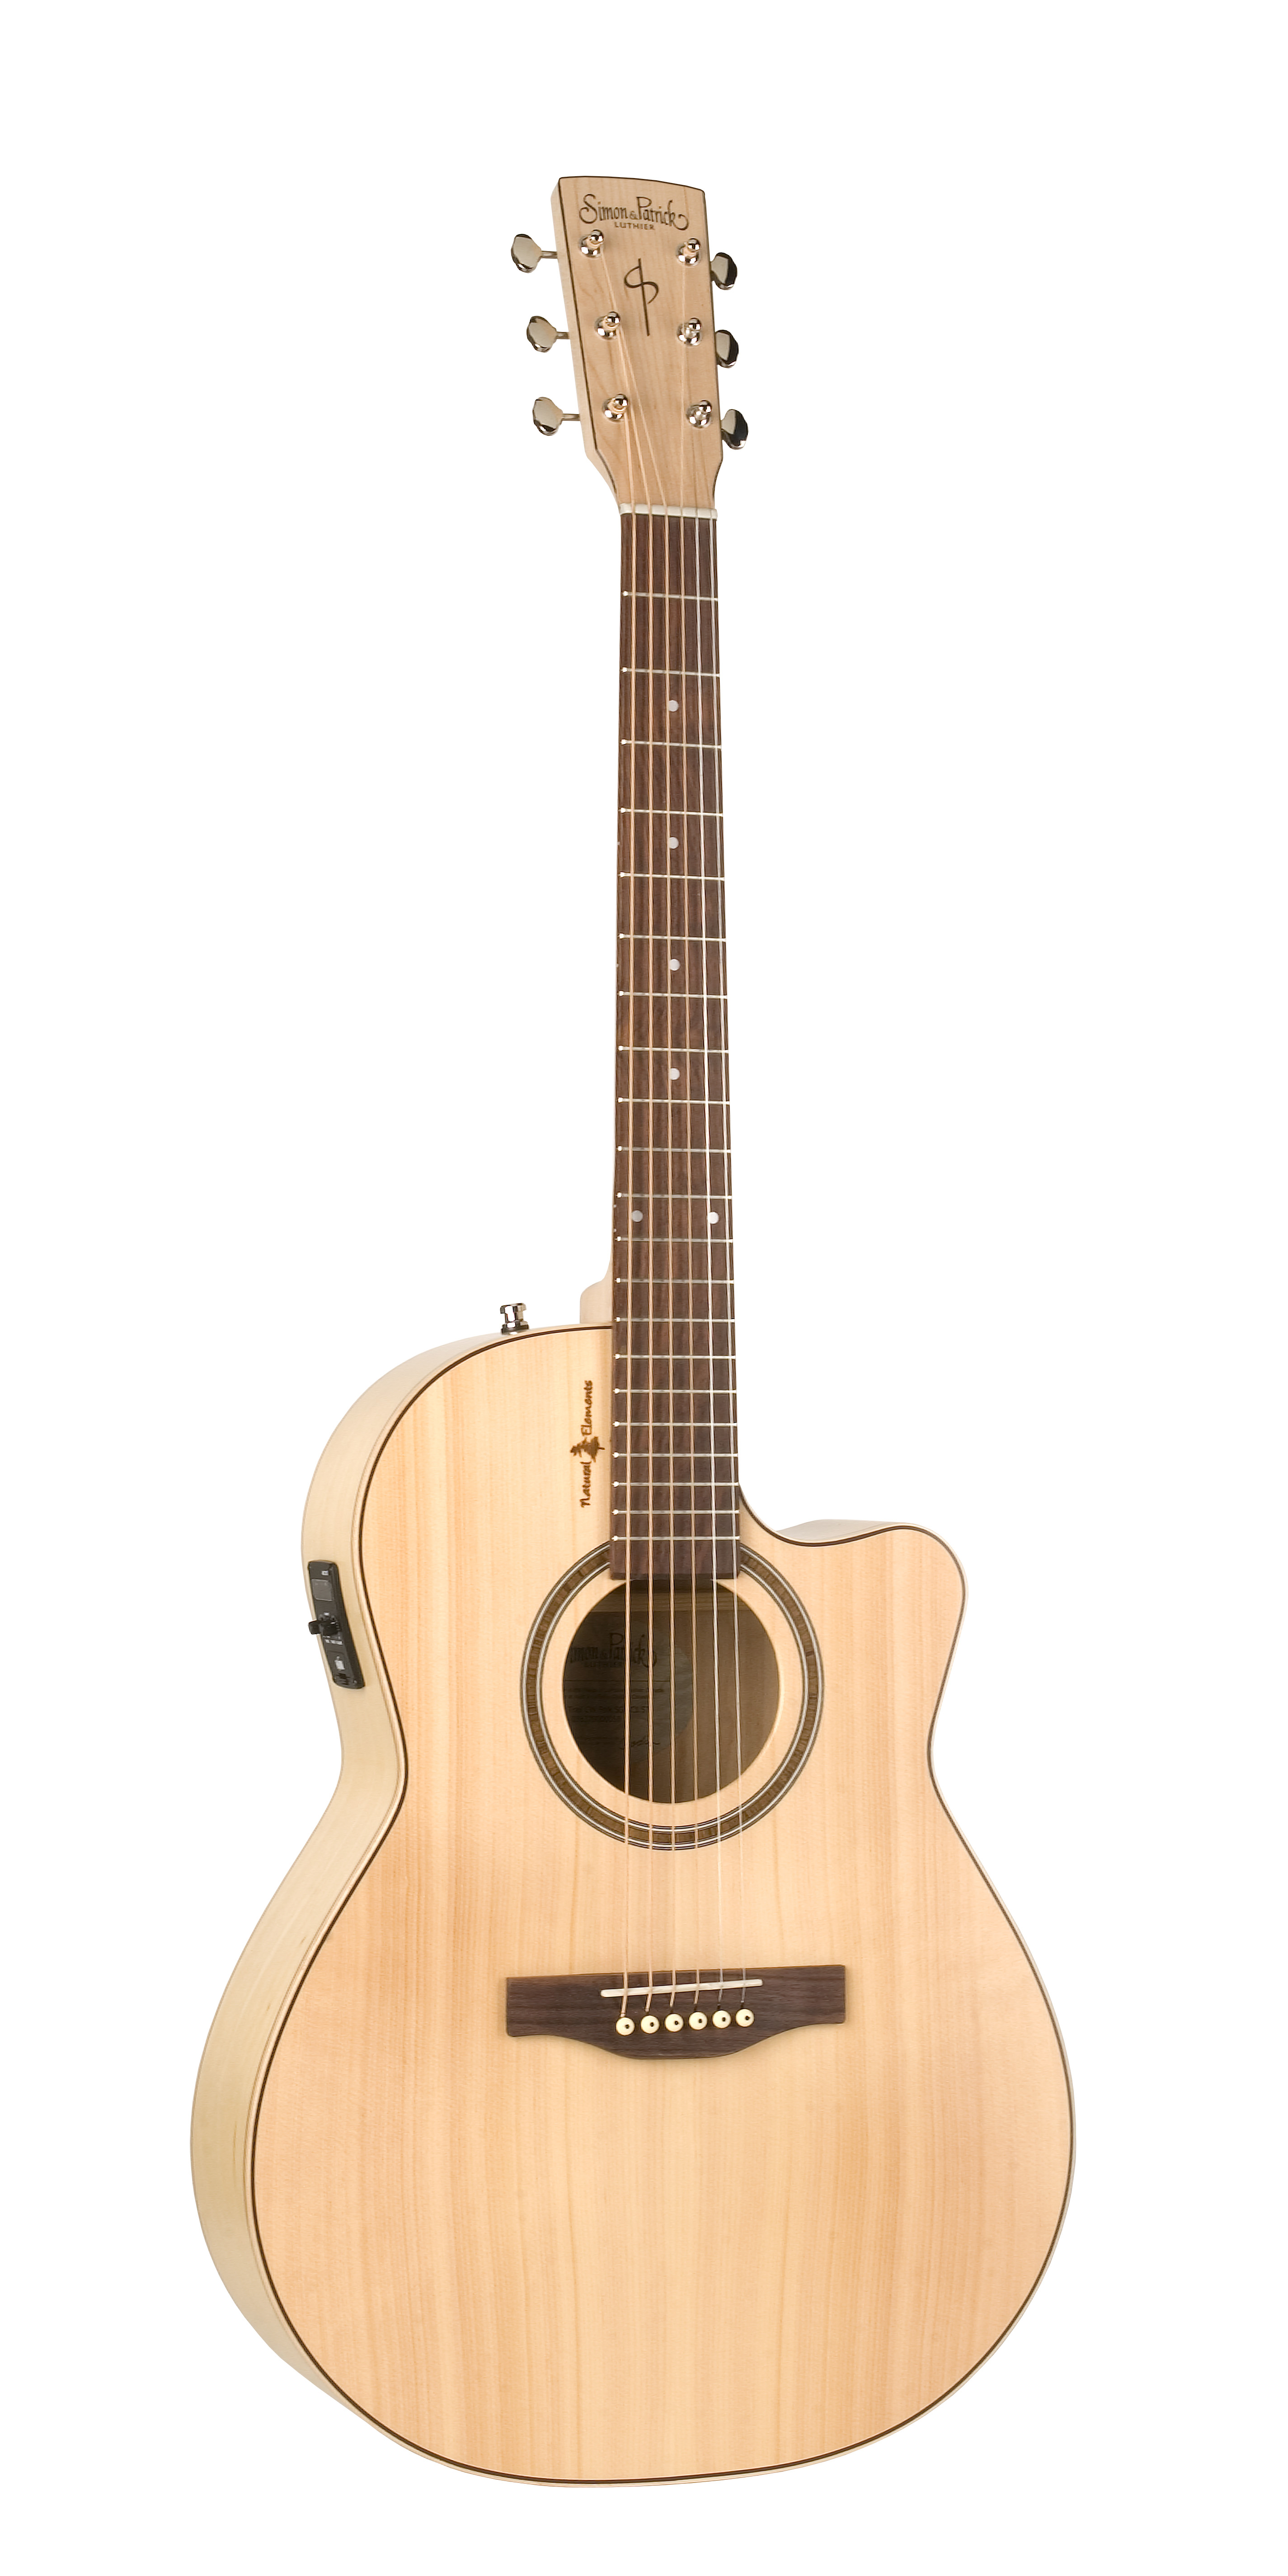 Simon & Patrick 36370 Natural Elements Amber Trail Cutaway Folk Acoustic Electric Guitar w/ B-band T35